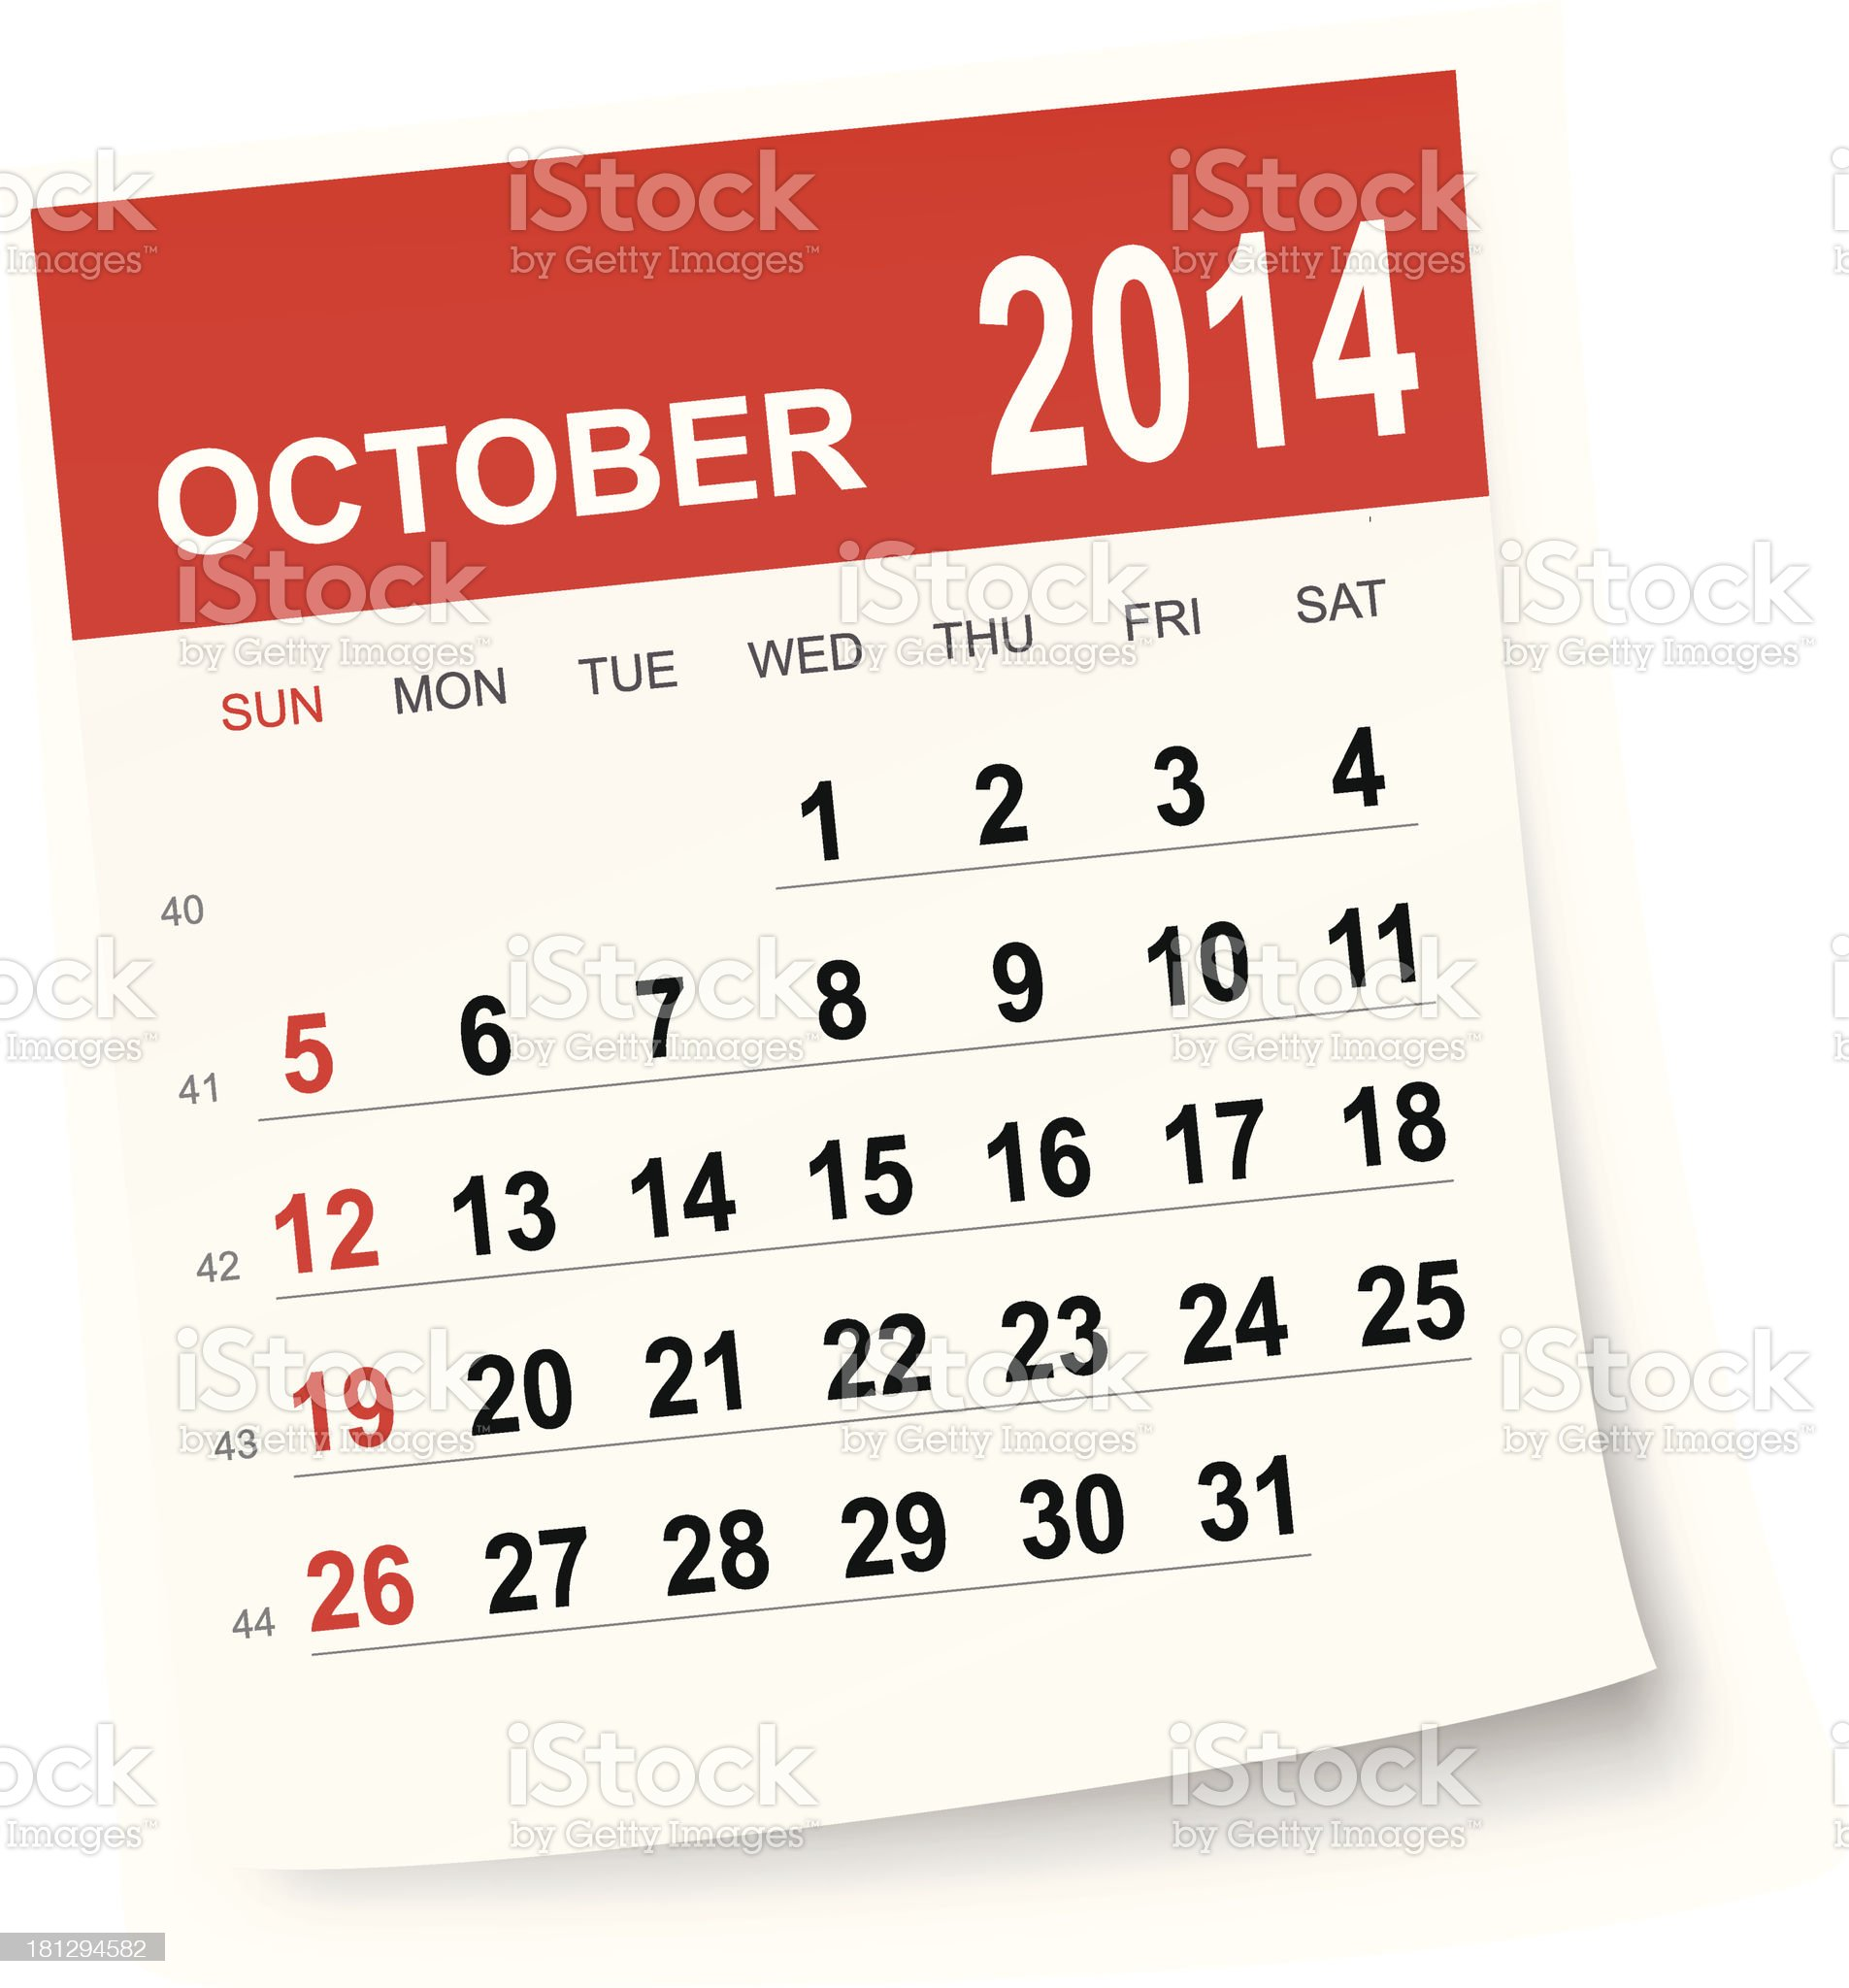 October 2014 calendar royalty-free stock vector art